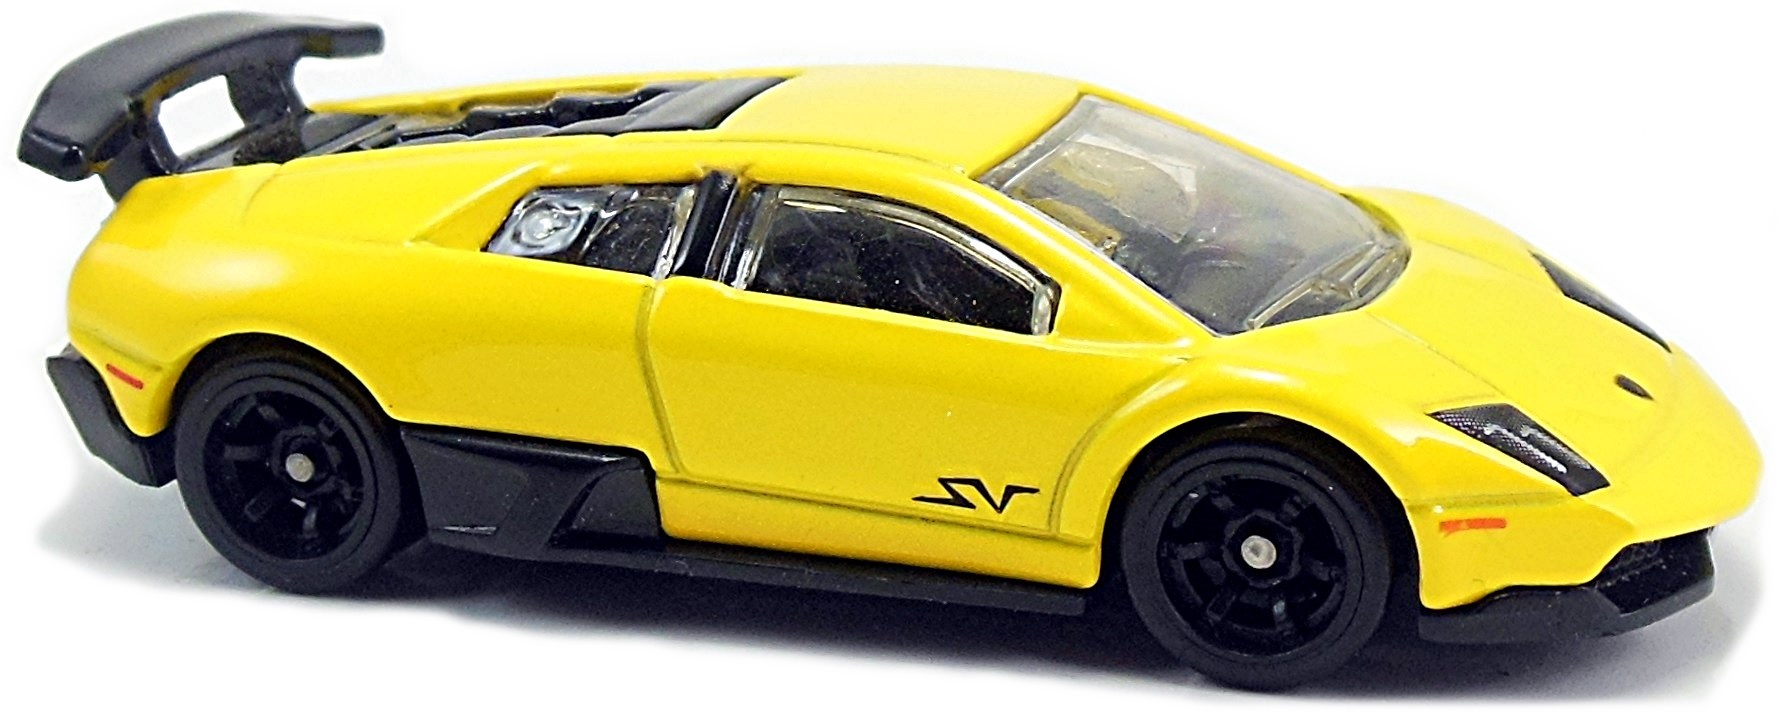 Lamborghini Murcielago Lp 670 4 Superveloce B Hot Wheels Newsletter